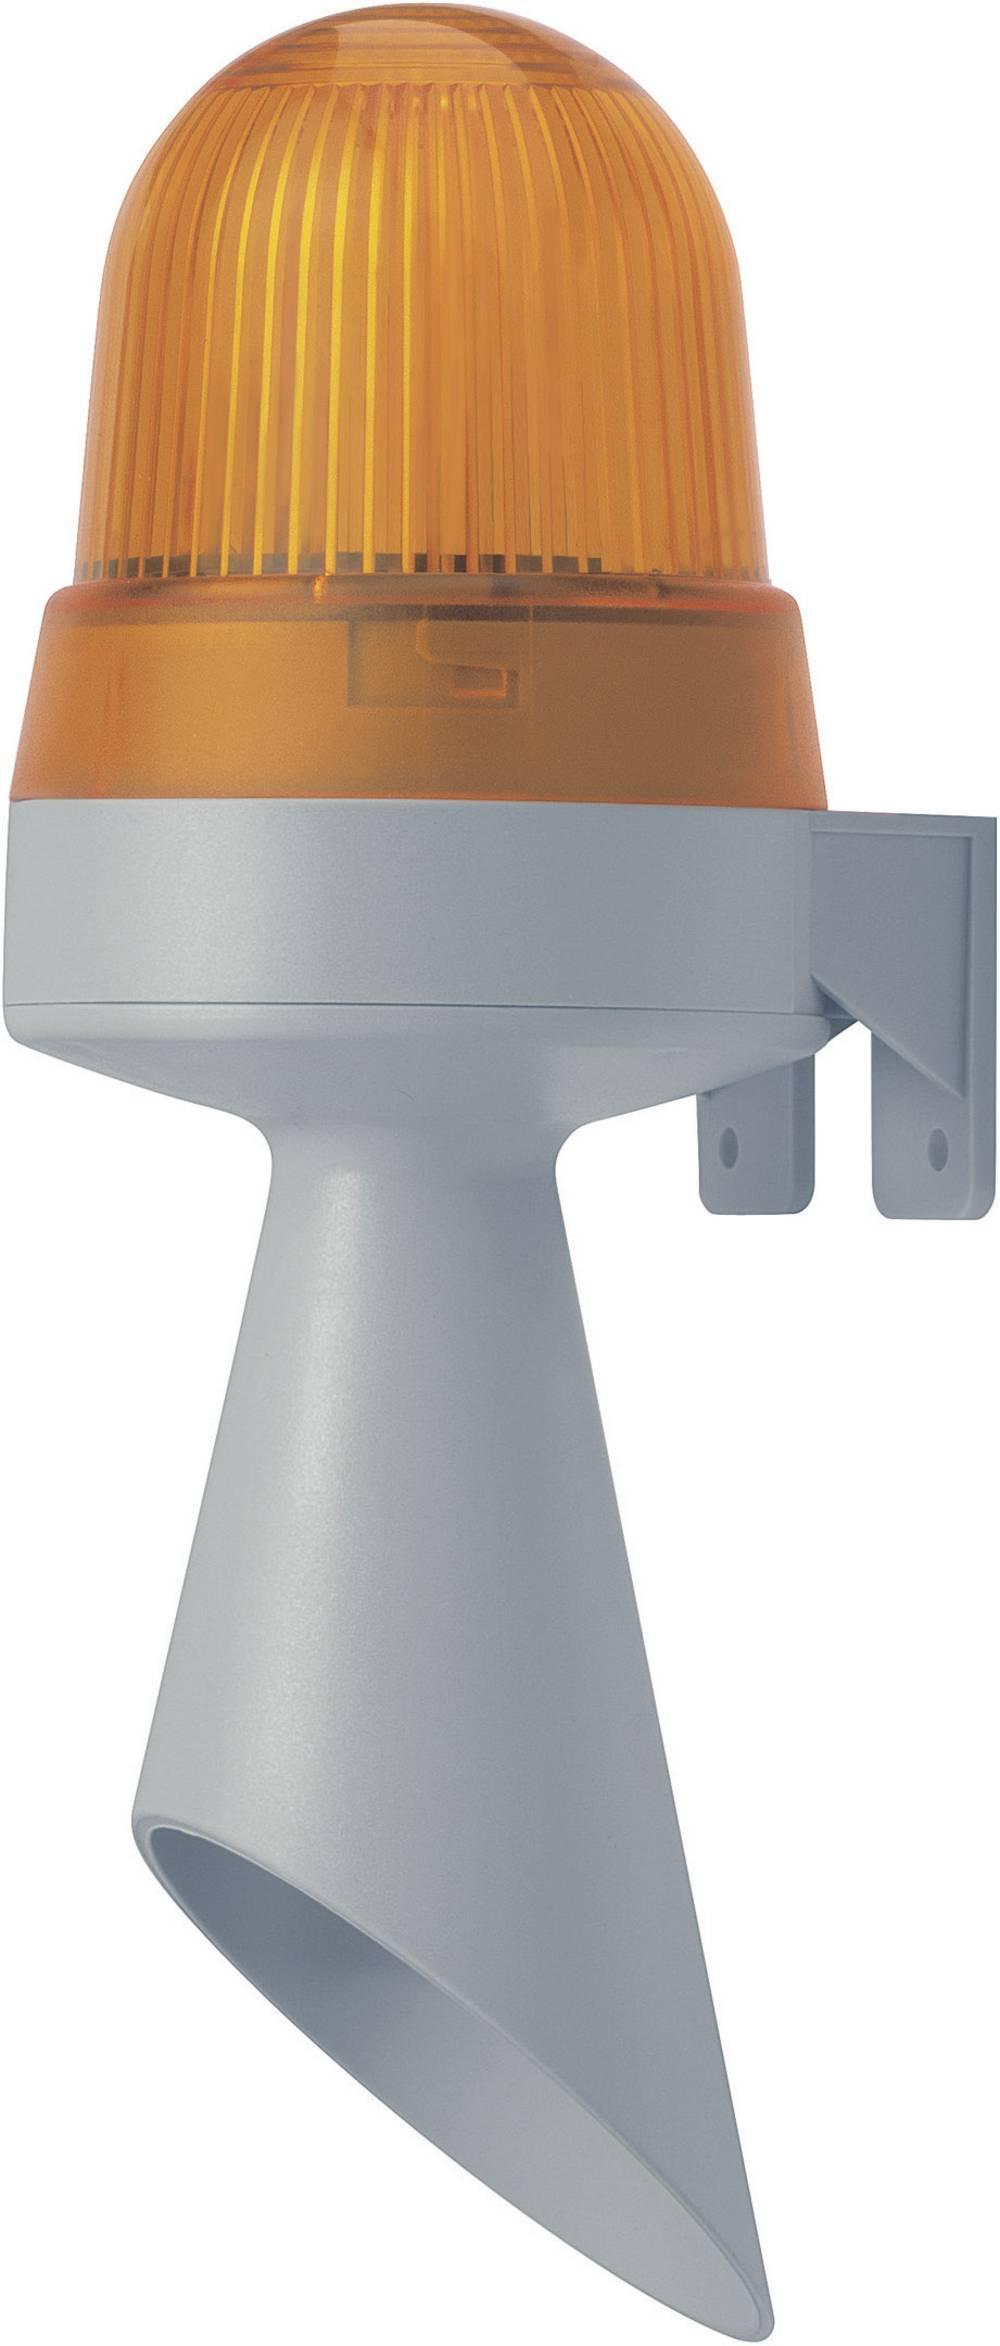 LED TROBLJA 424 WM 8 TONOV 24V/AC/DC RDEČA Werma Signaltechnik 424.120.75